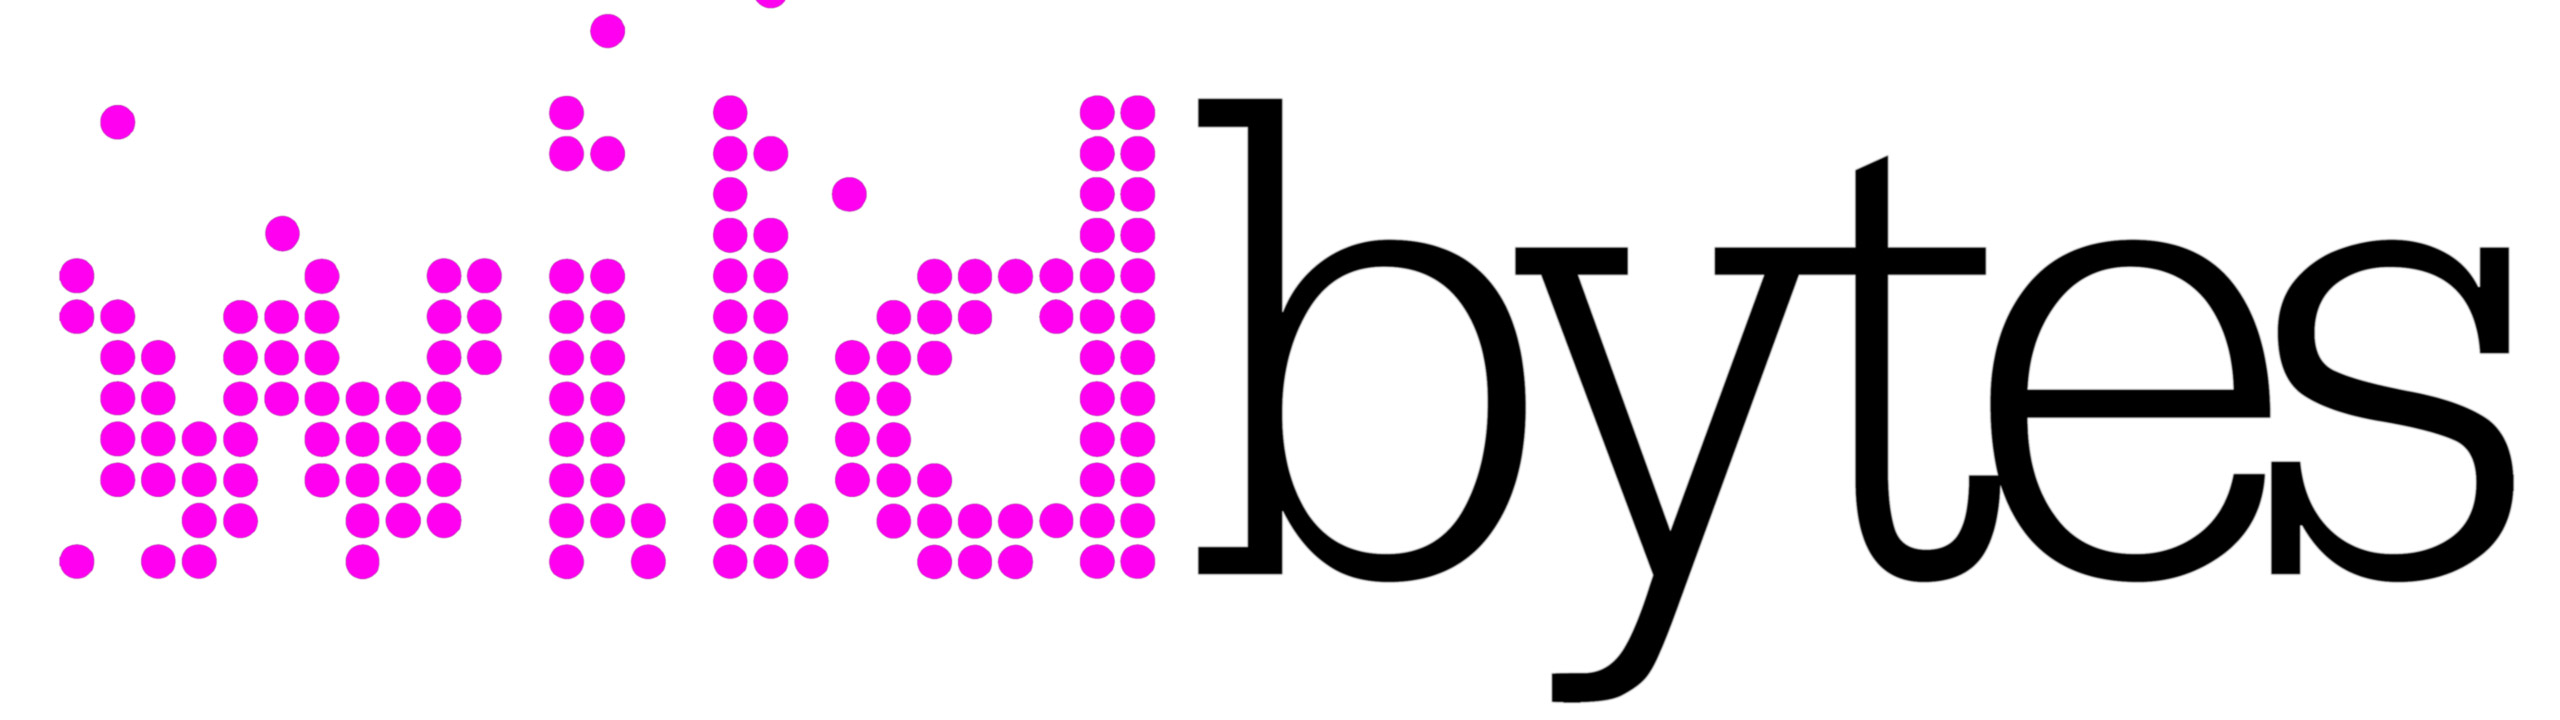 noid-logo-wildbytes-pink-640x180